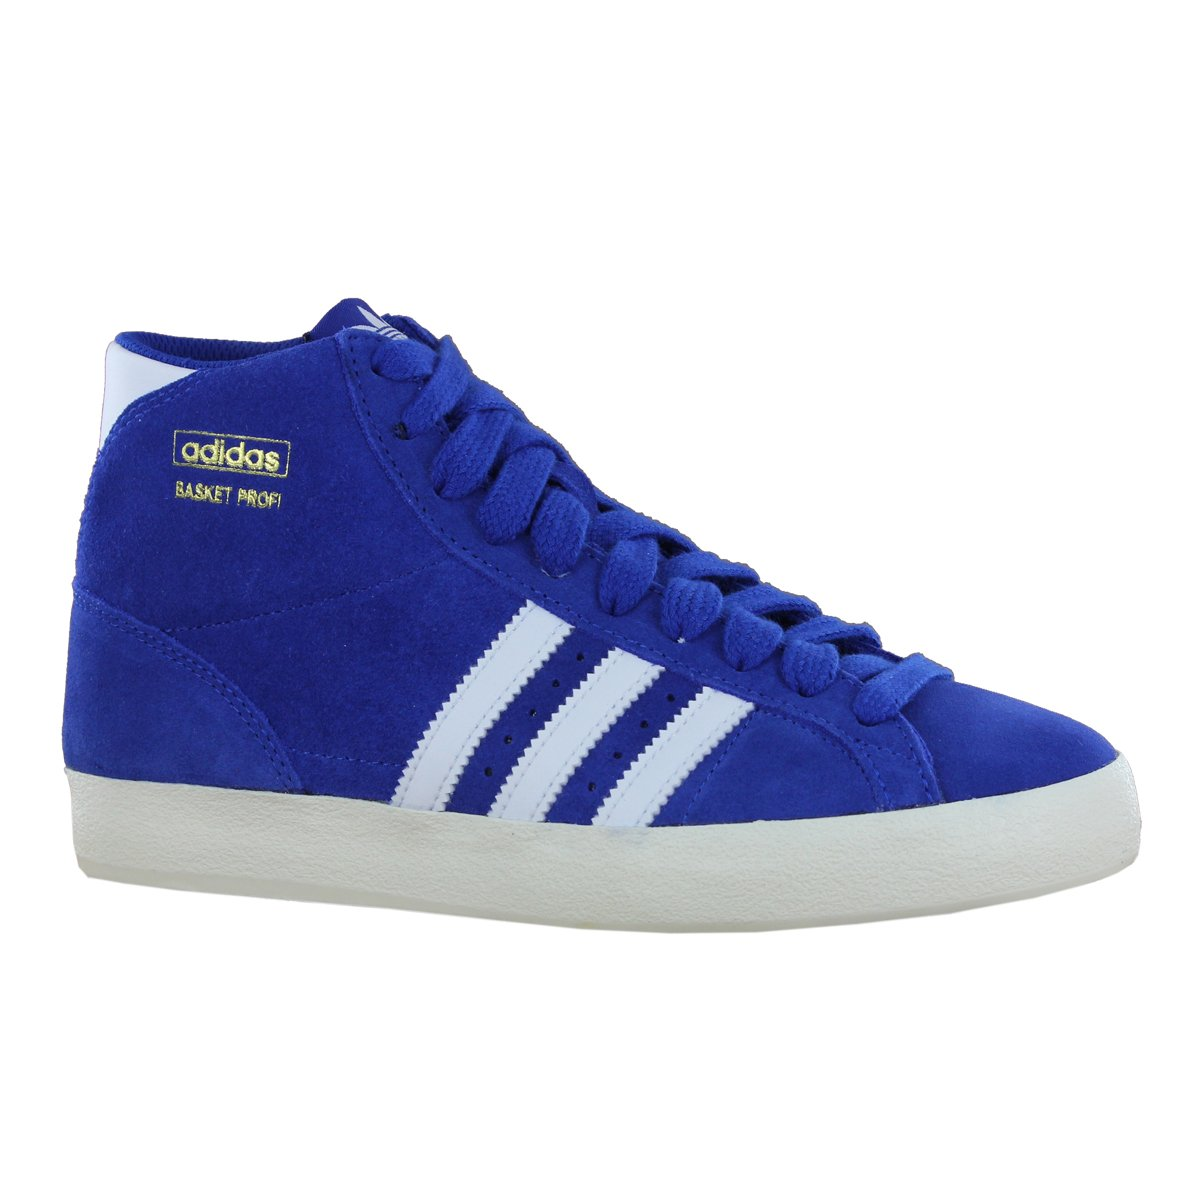 Amazon 5 Bleu It Borse Hqaci Blu Adidas Scarpe 36 E qnqWvptUB